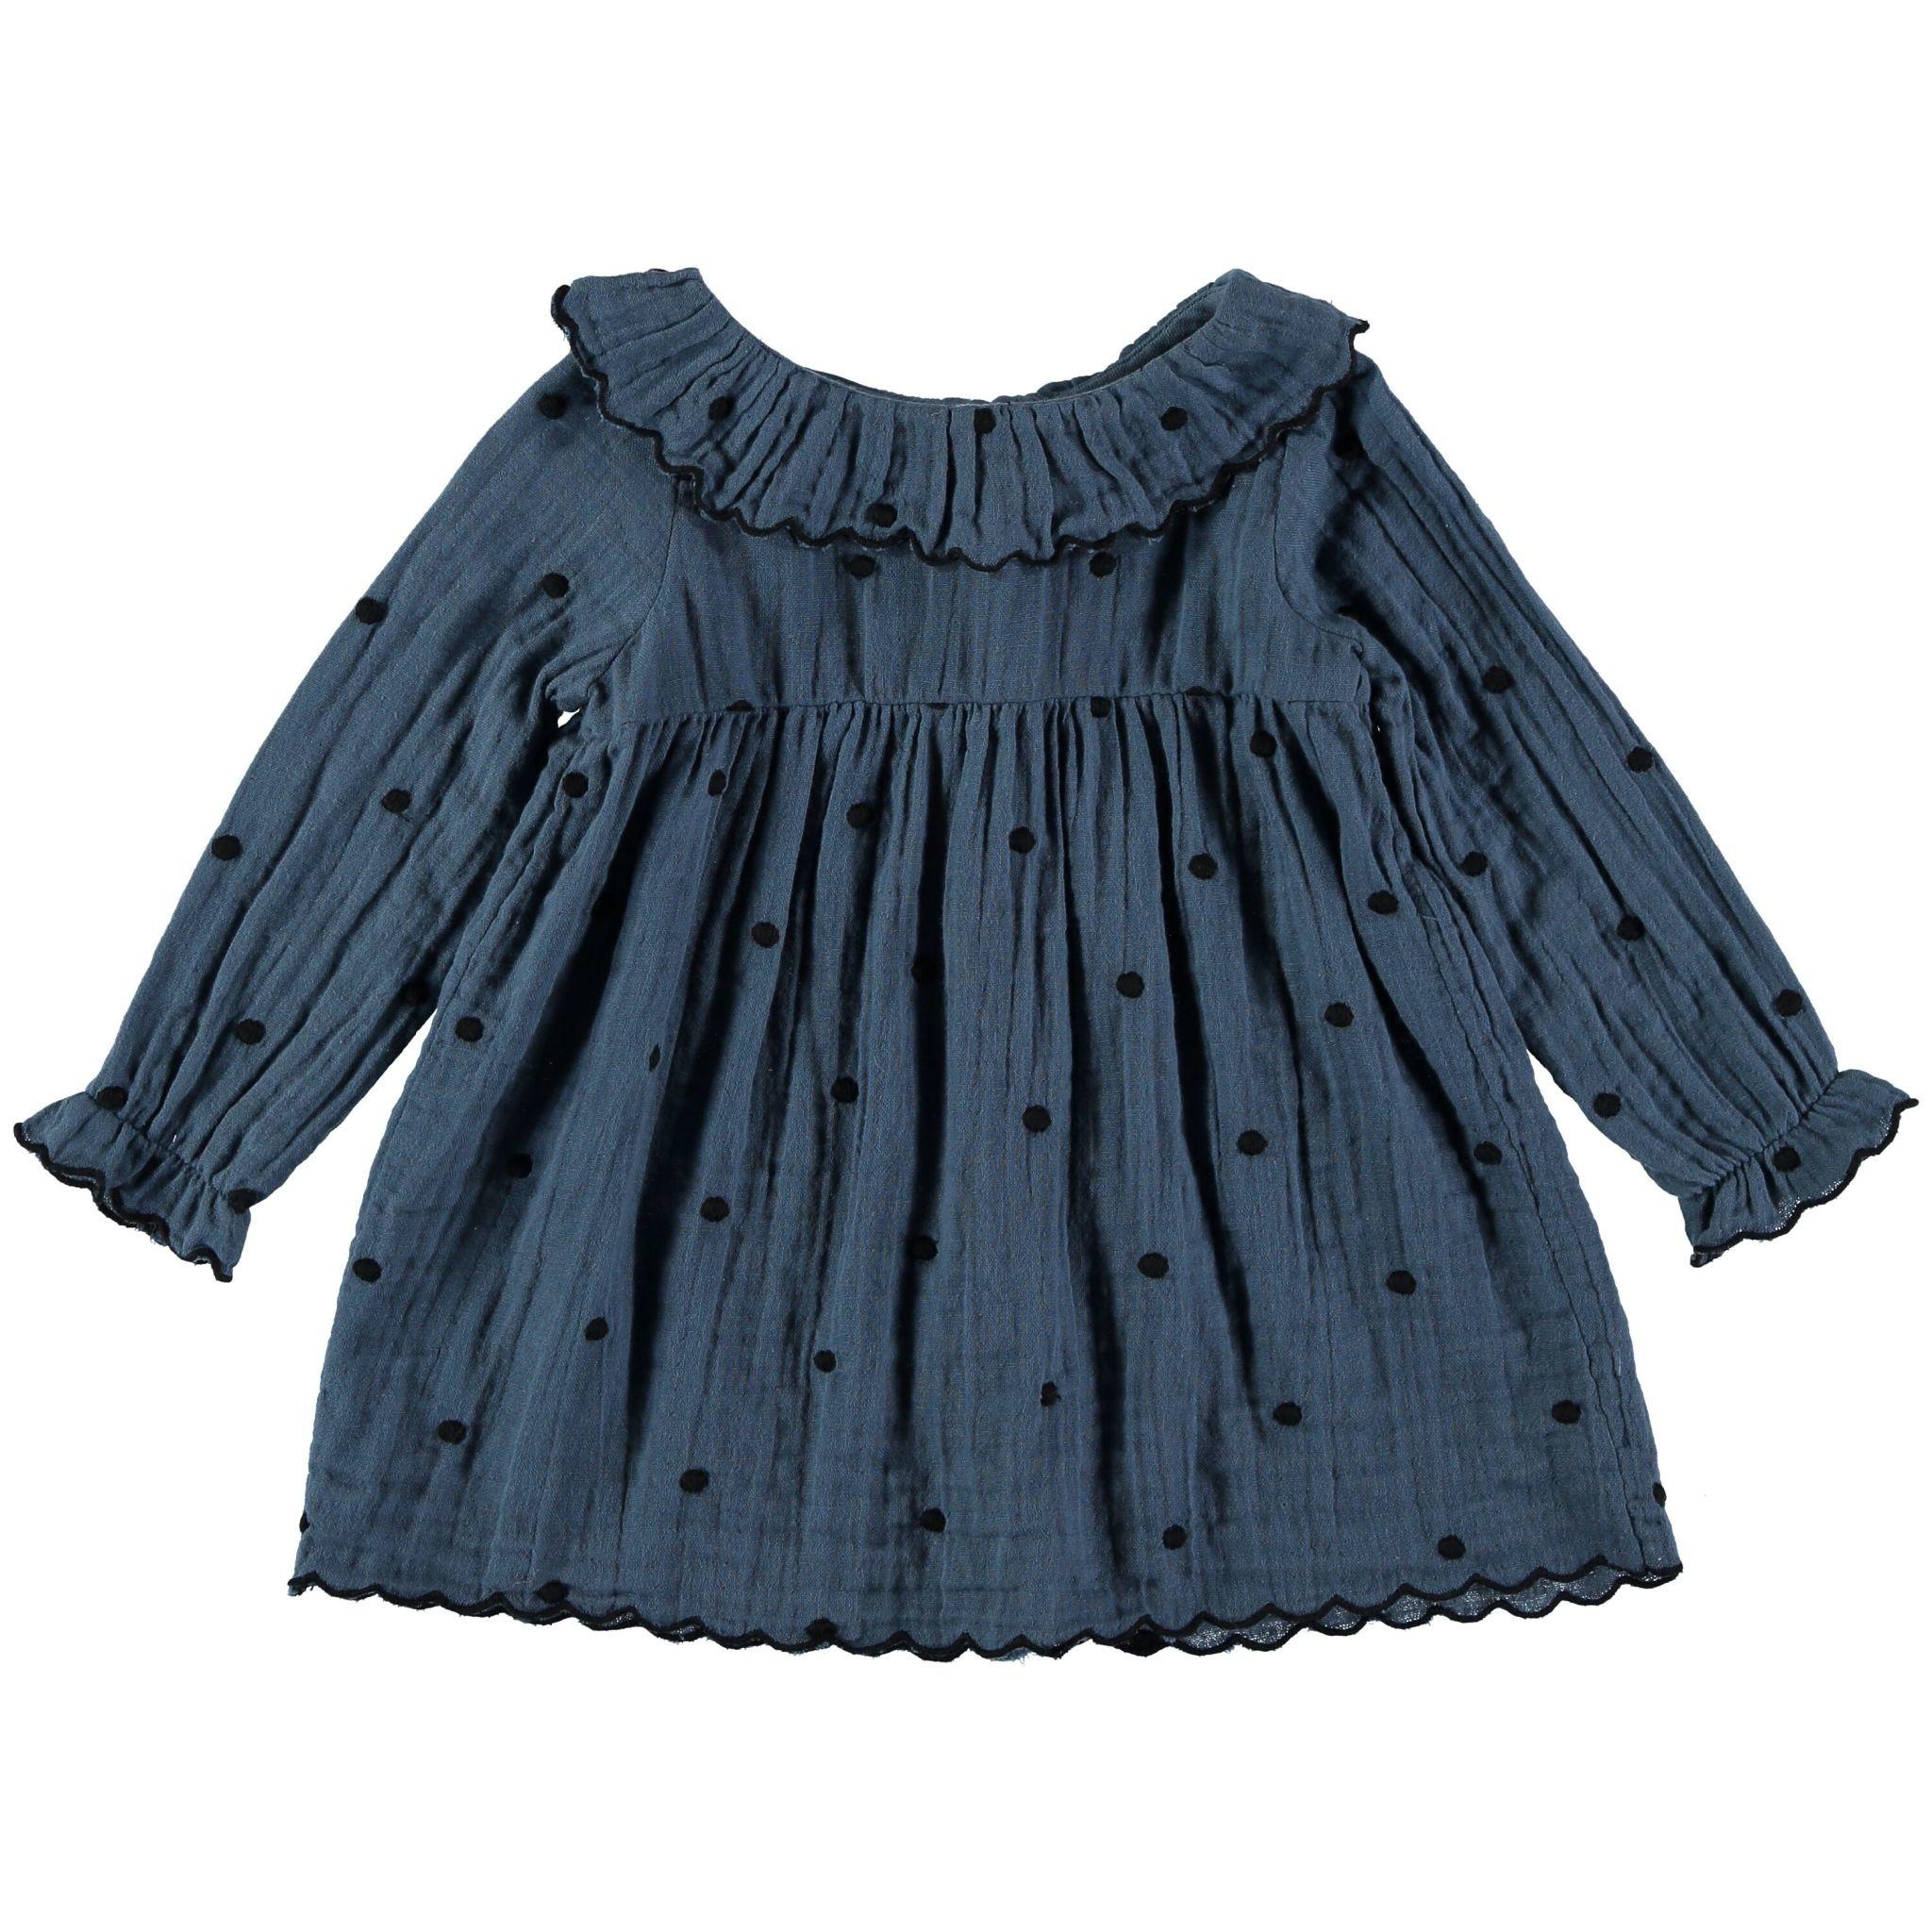 BUHO Noa Embroidery Dots Dress